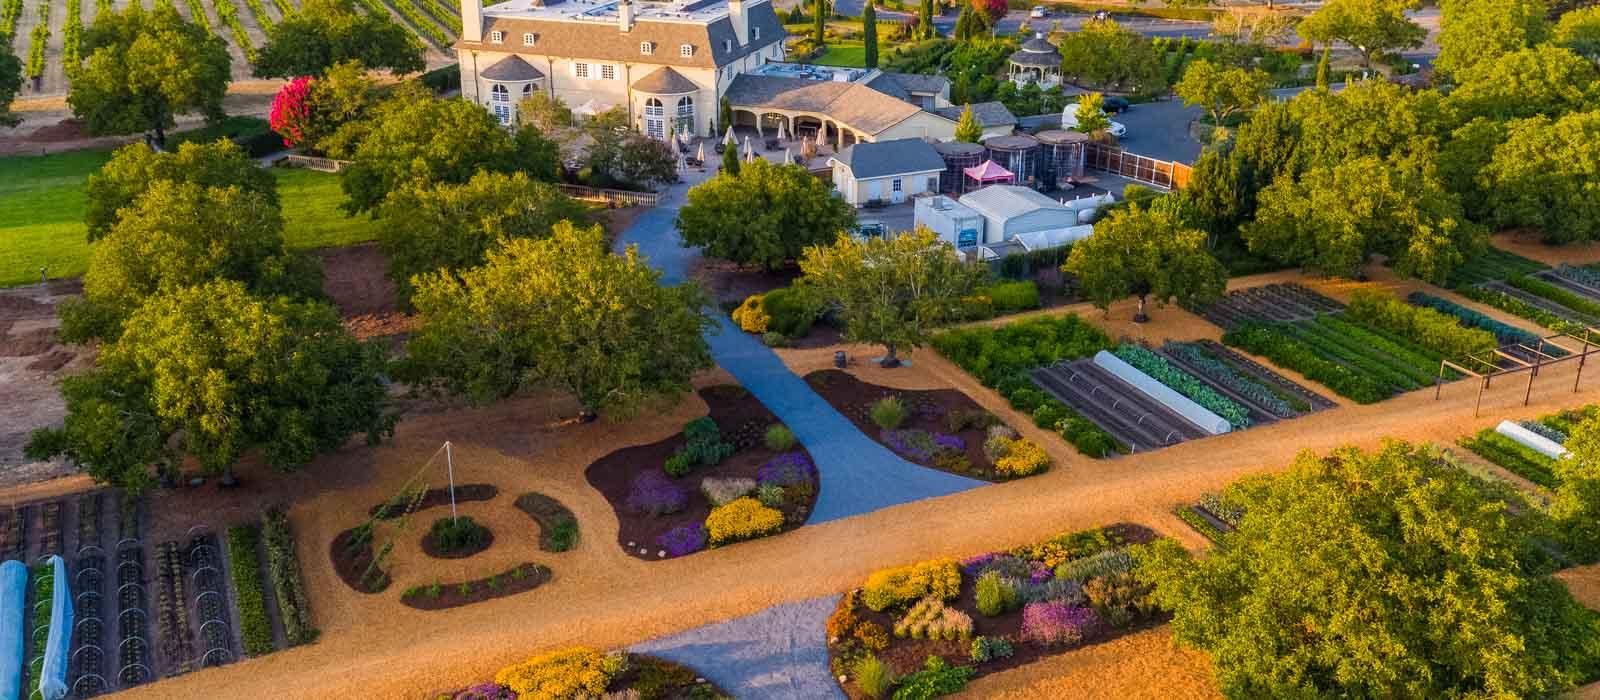 Kendall-Jackson Winery Gardens